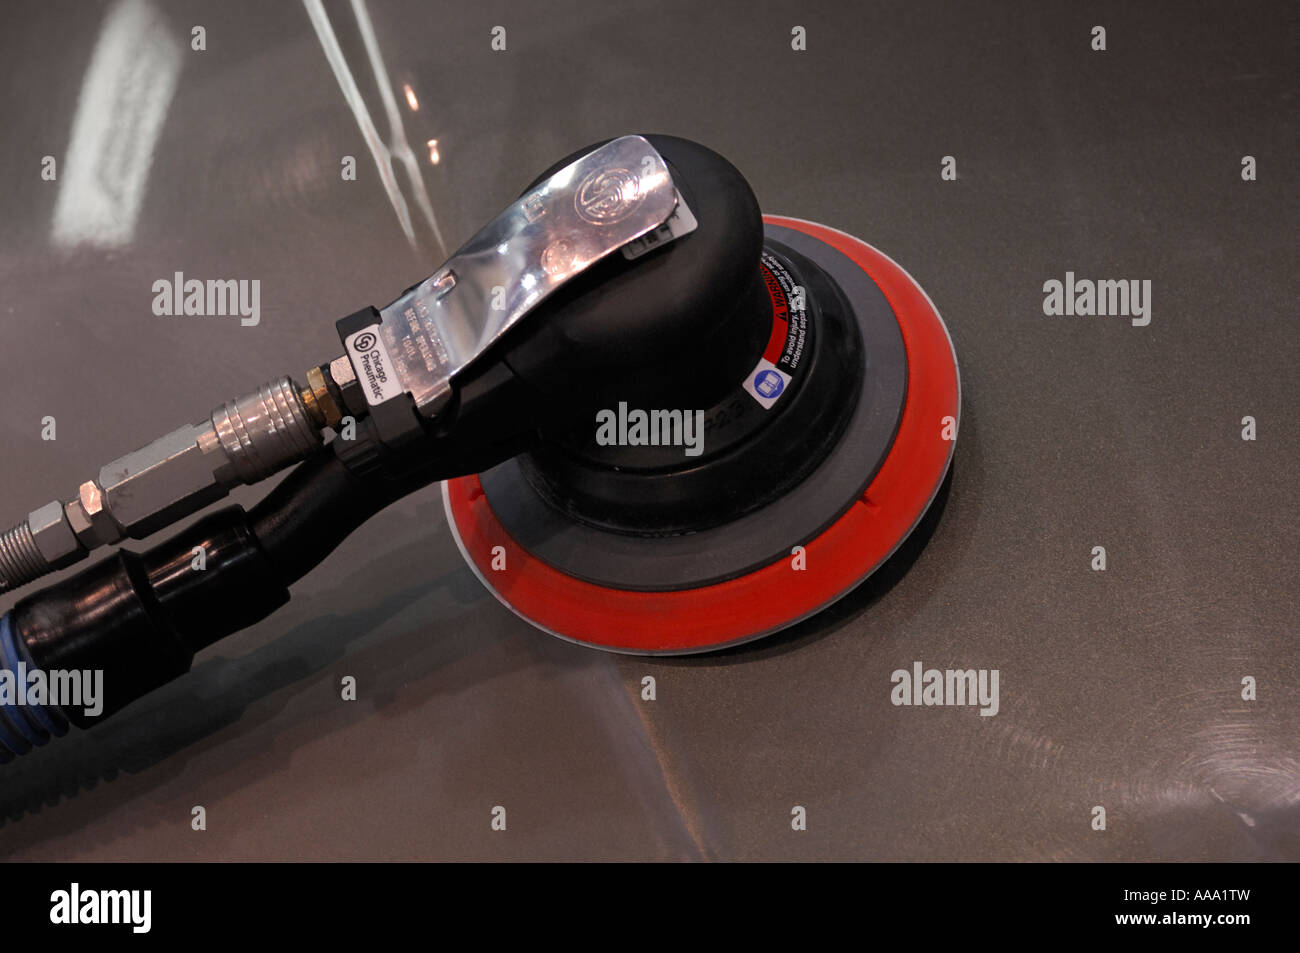 Pneumatic orbital palm air sander on a car hood Auto workshop repair shop tool - Stock Image